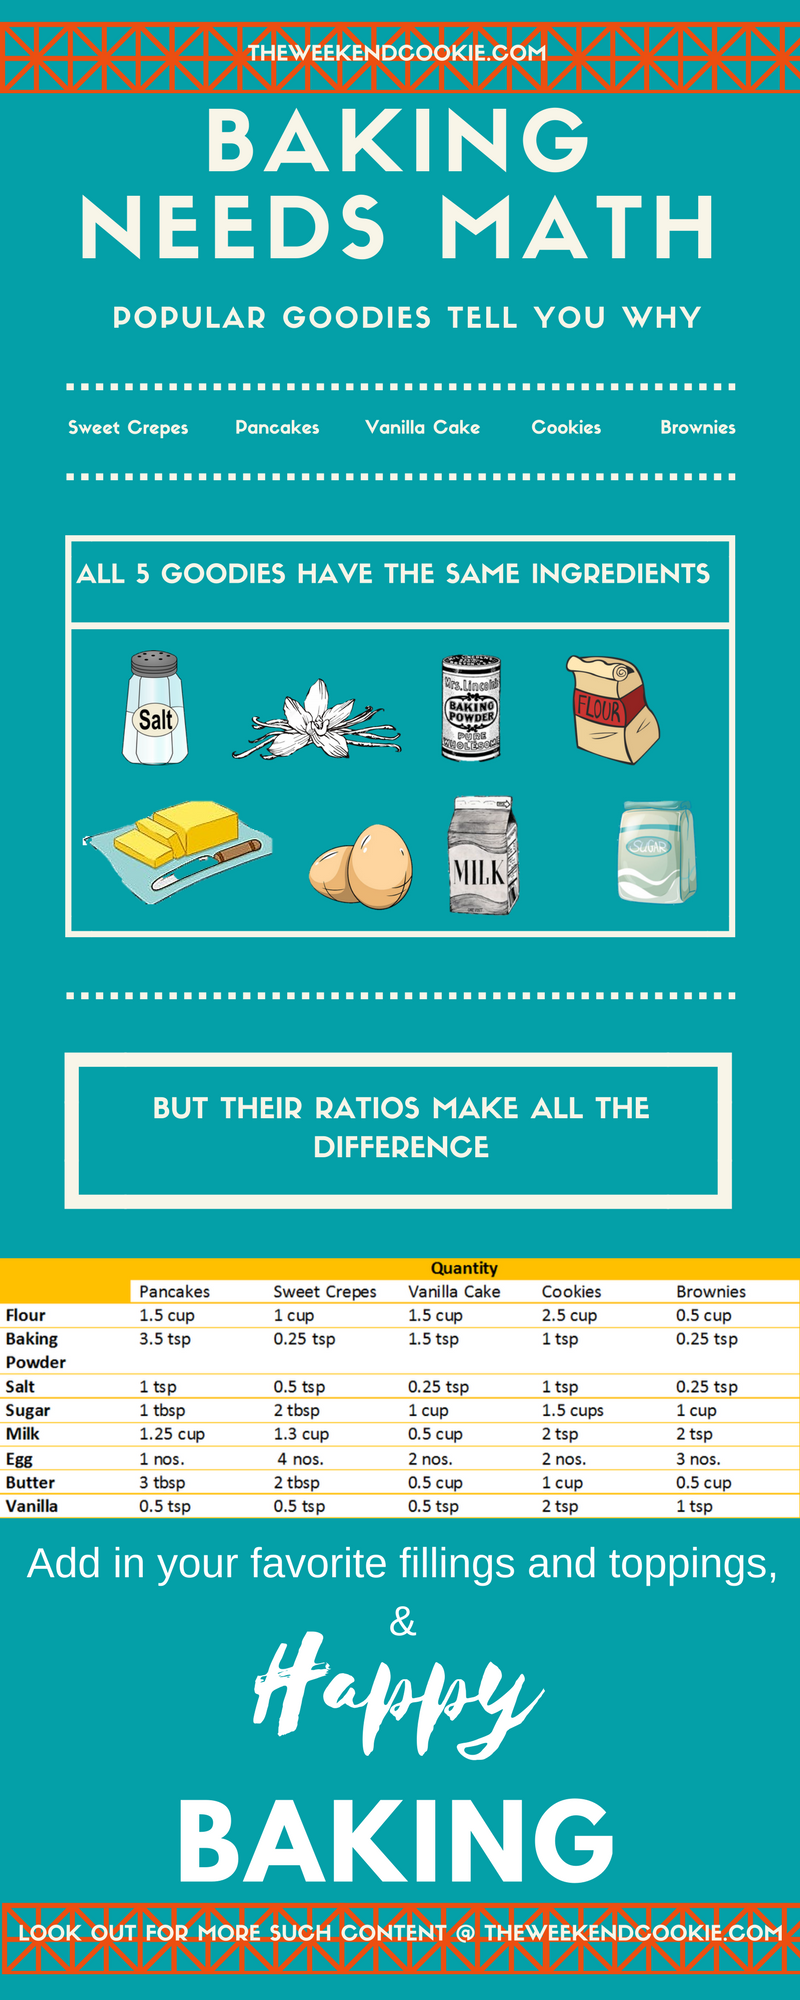 Baking needs math